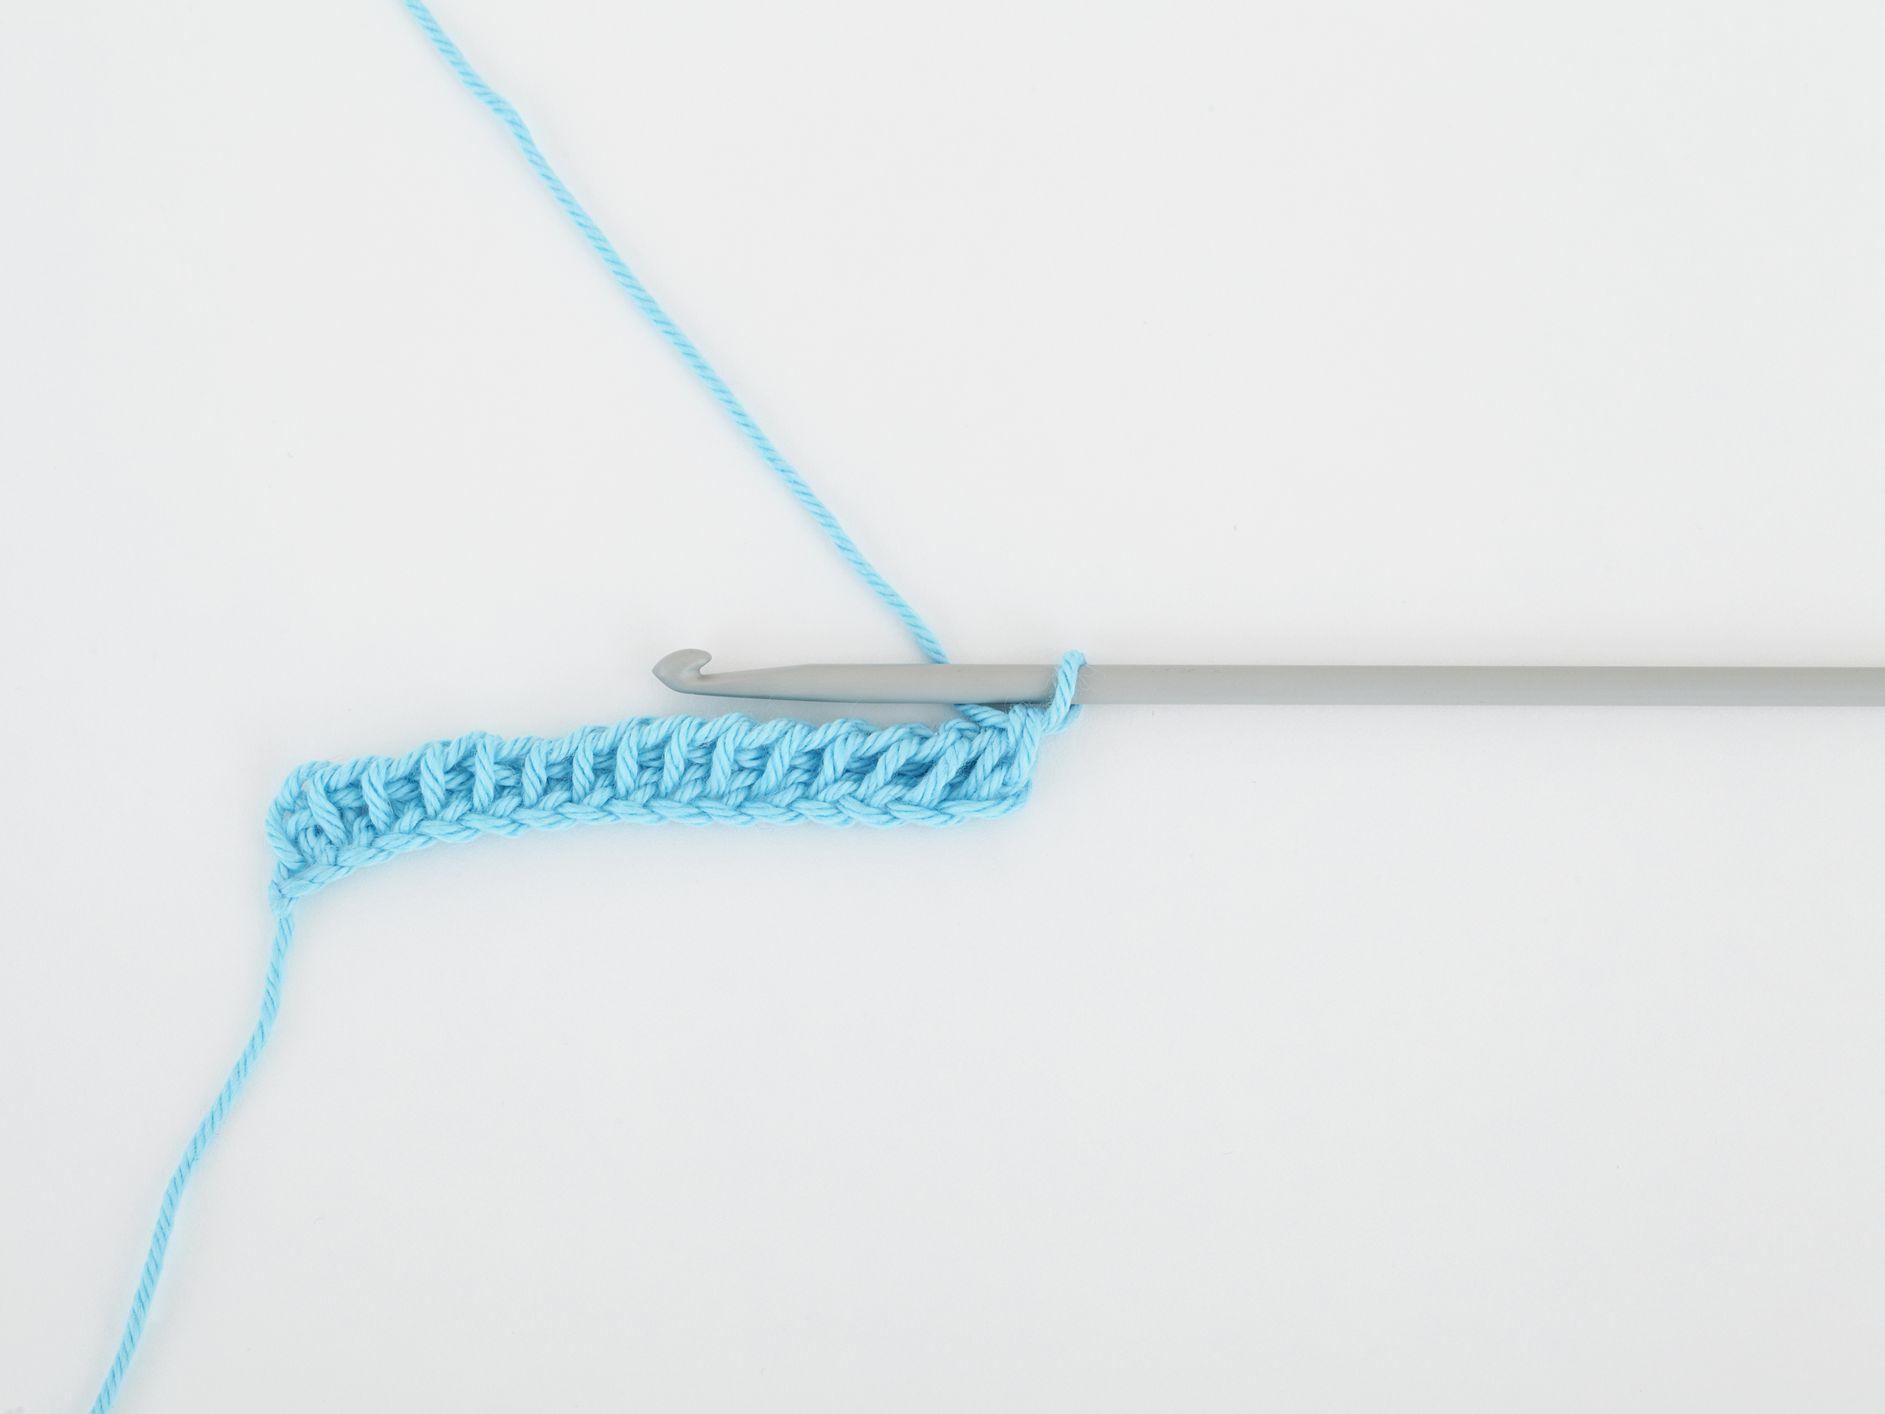 Tunisian Crochet Stitches Tutorial